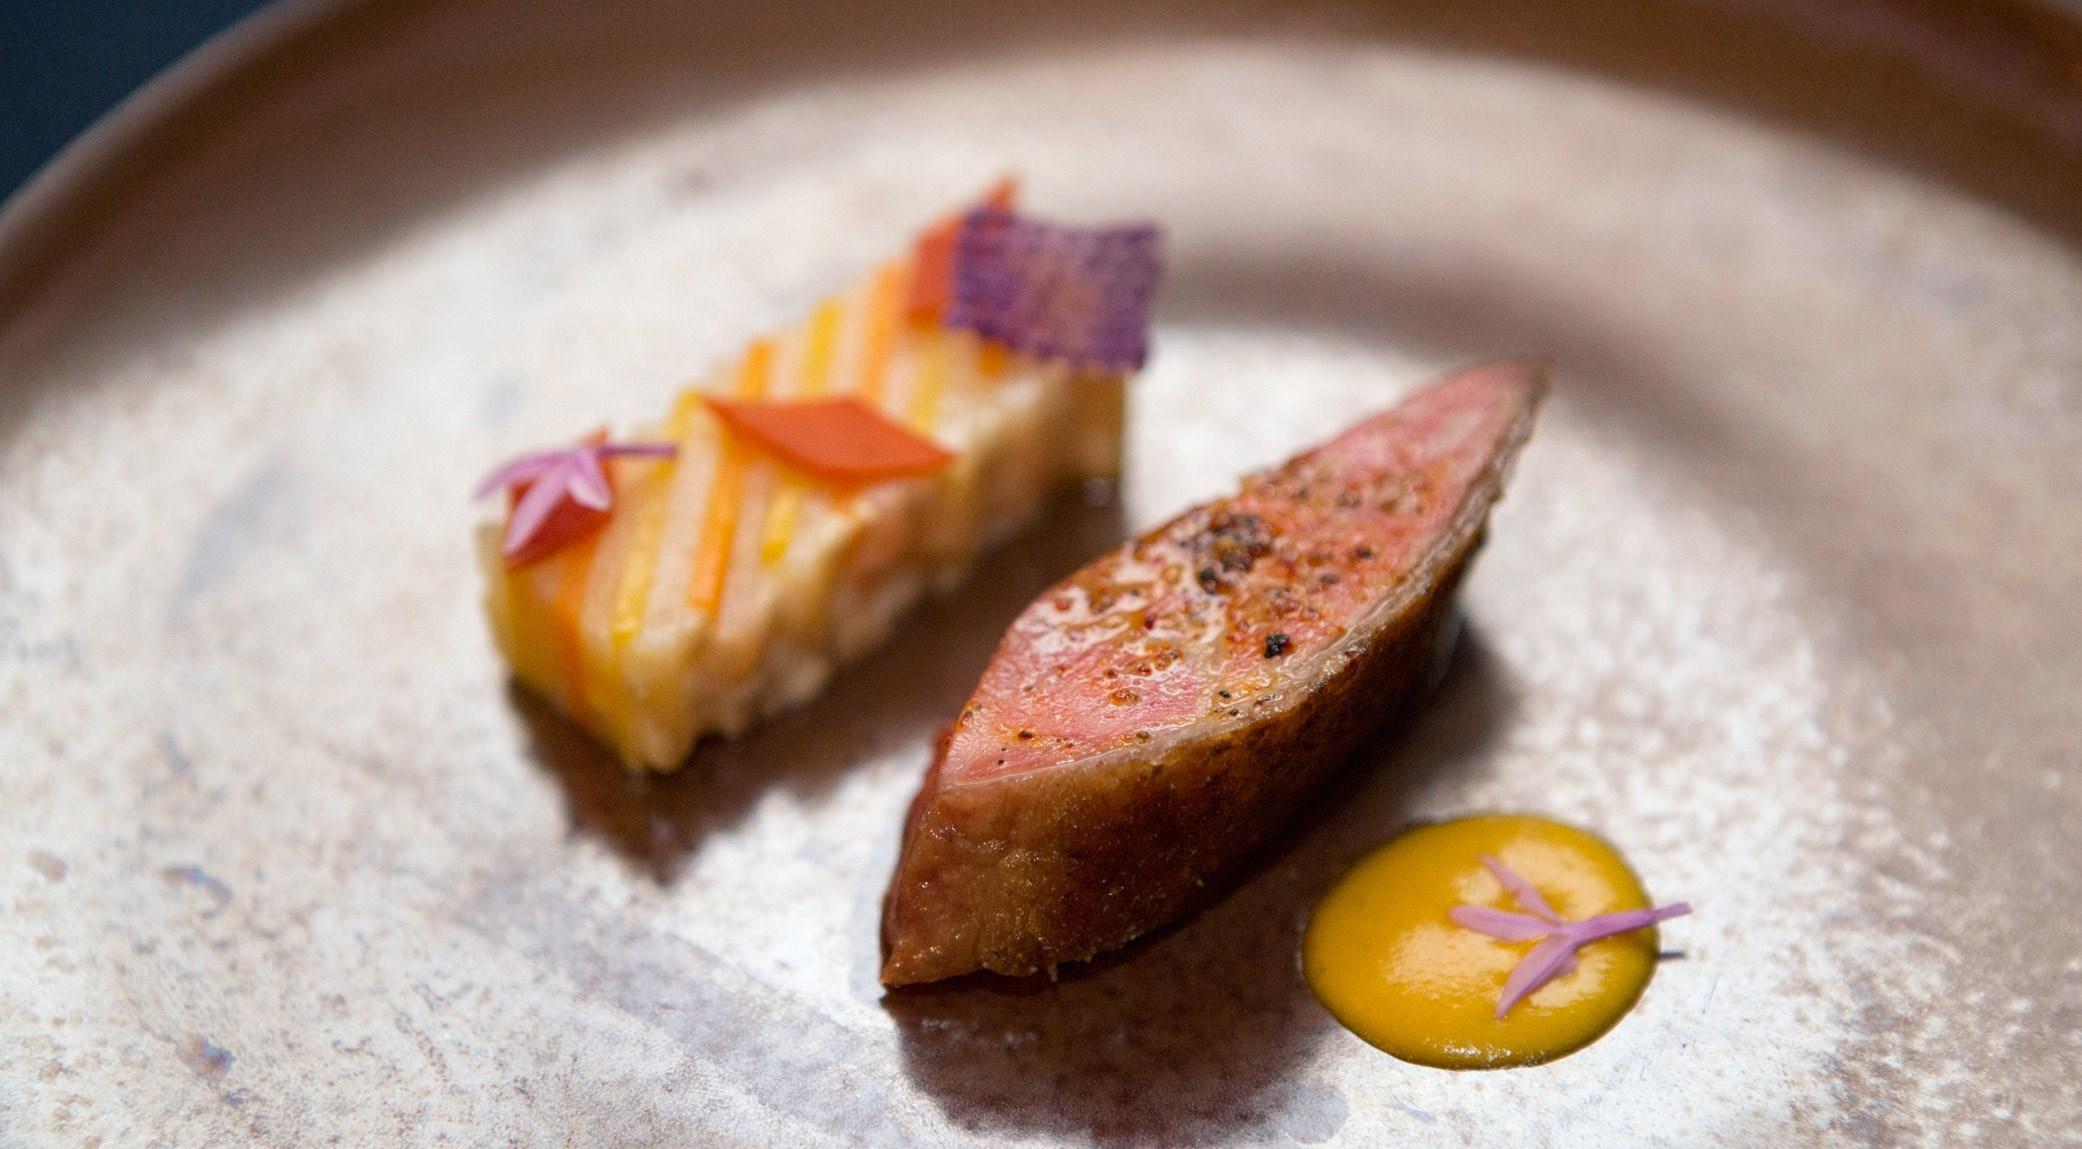 Mitch Lienhard - Canard rôti, orange épicée et Yam